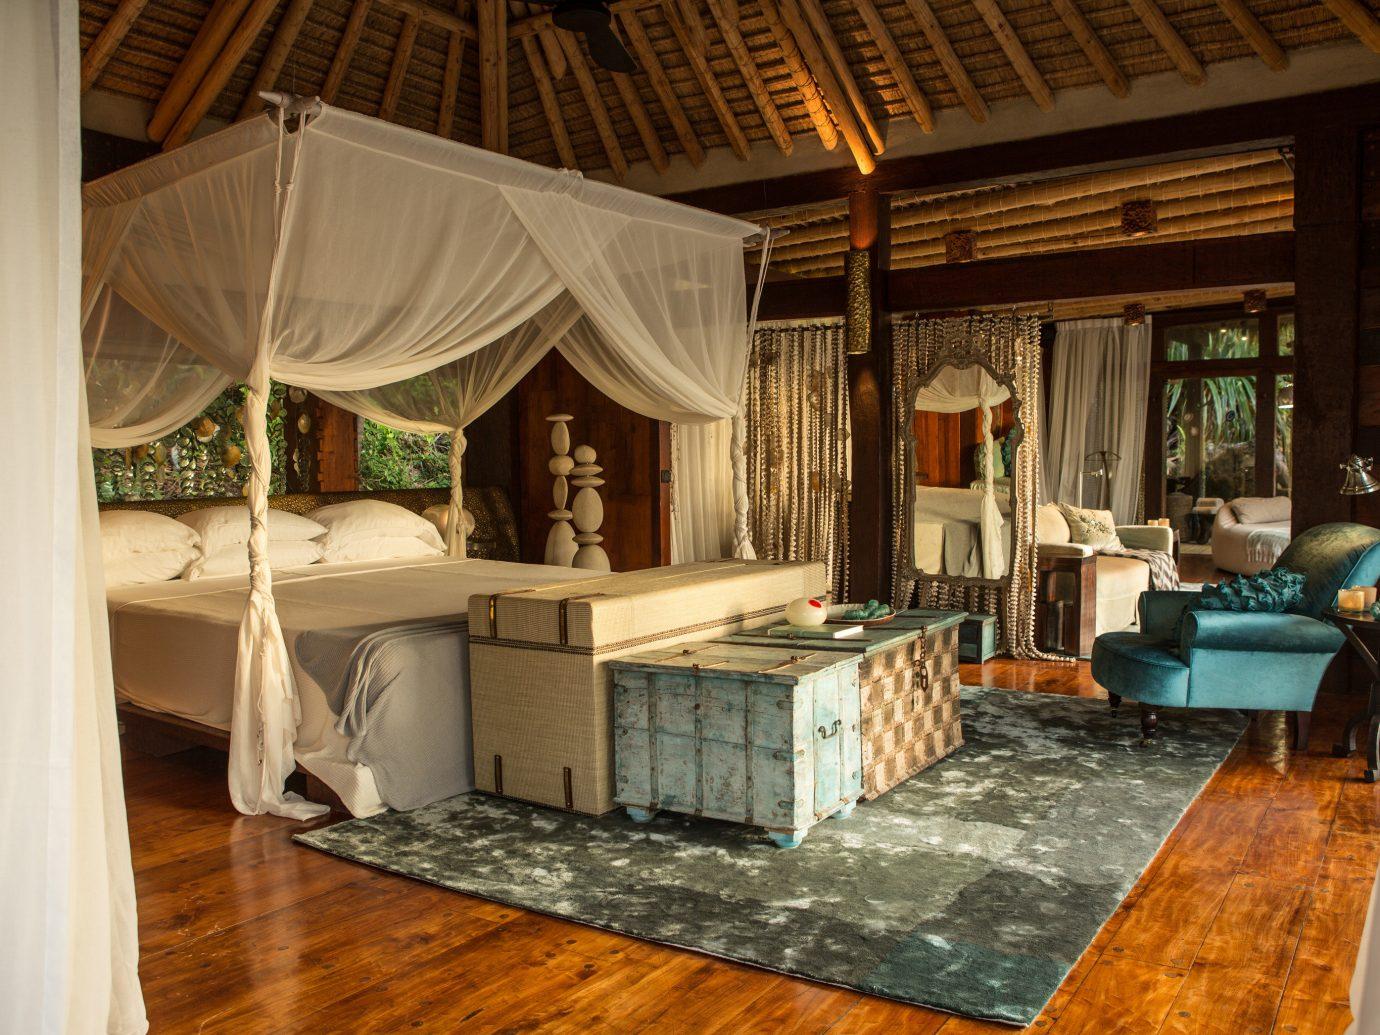 Luxury Travel Trip Ideas floor indoor room Living interior design furniture wood tent flooring stone